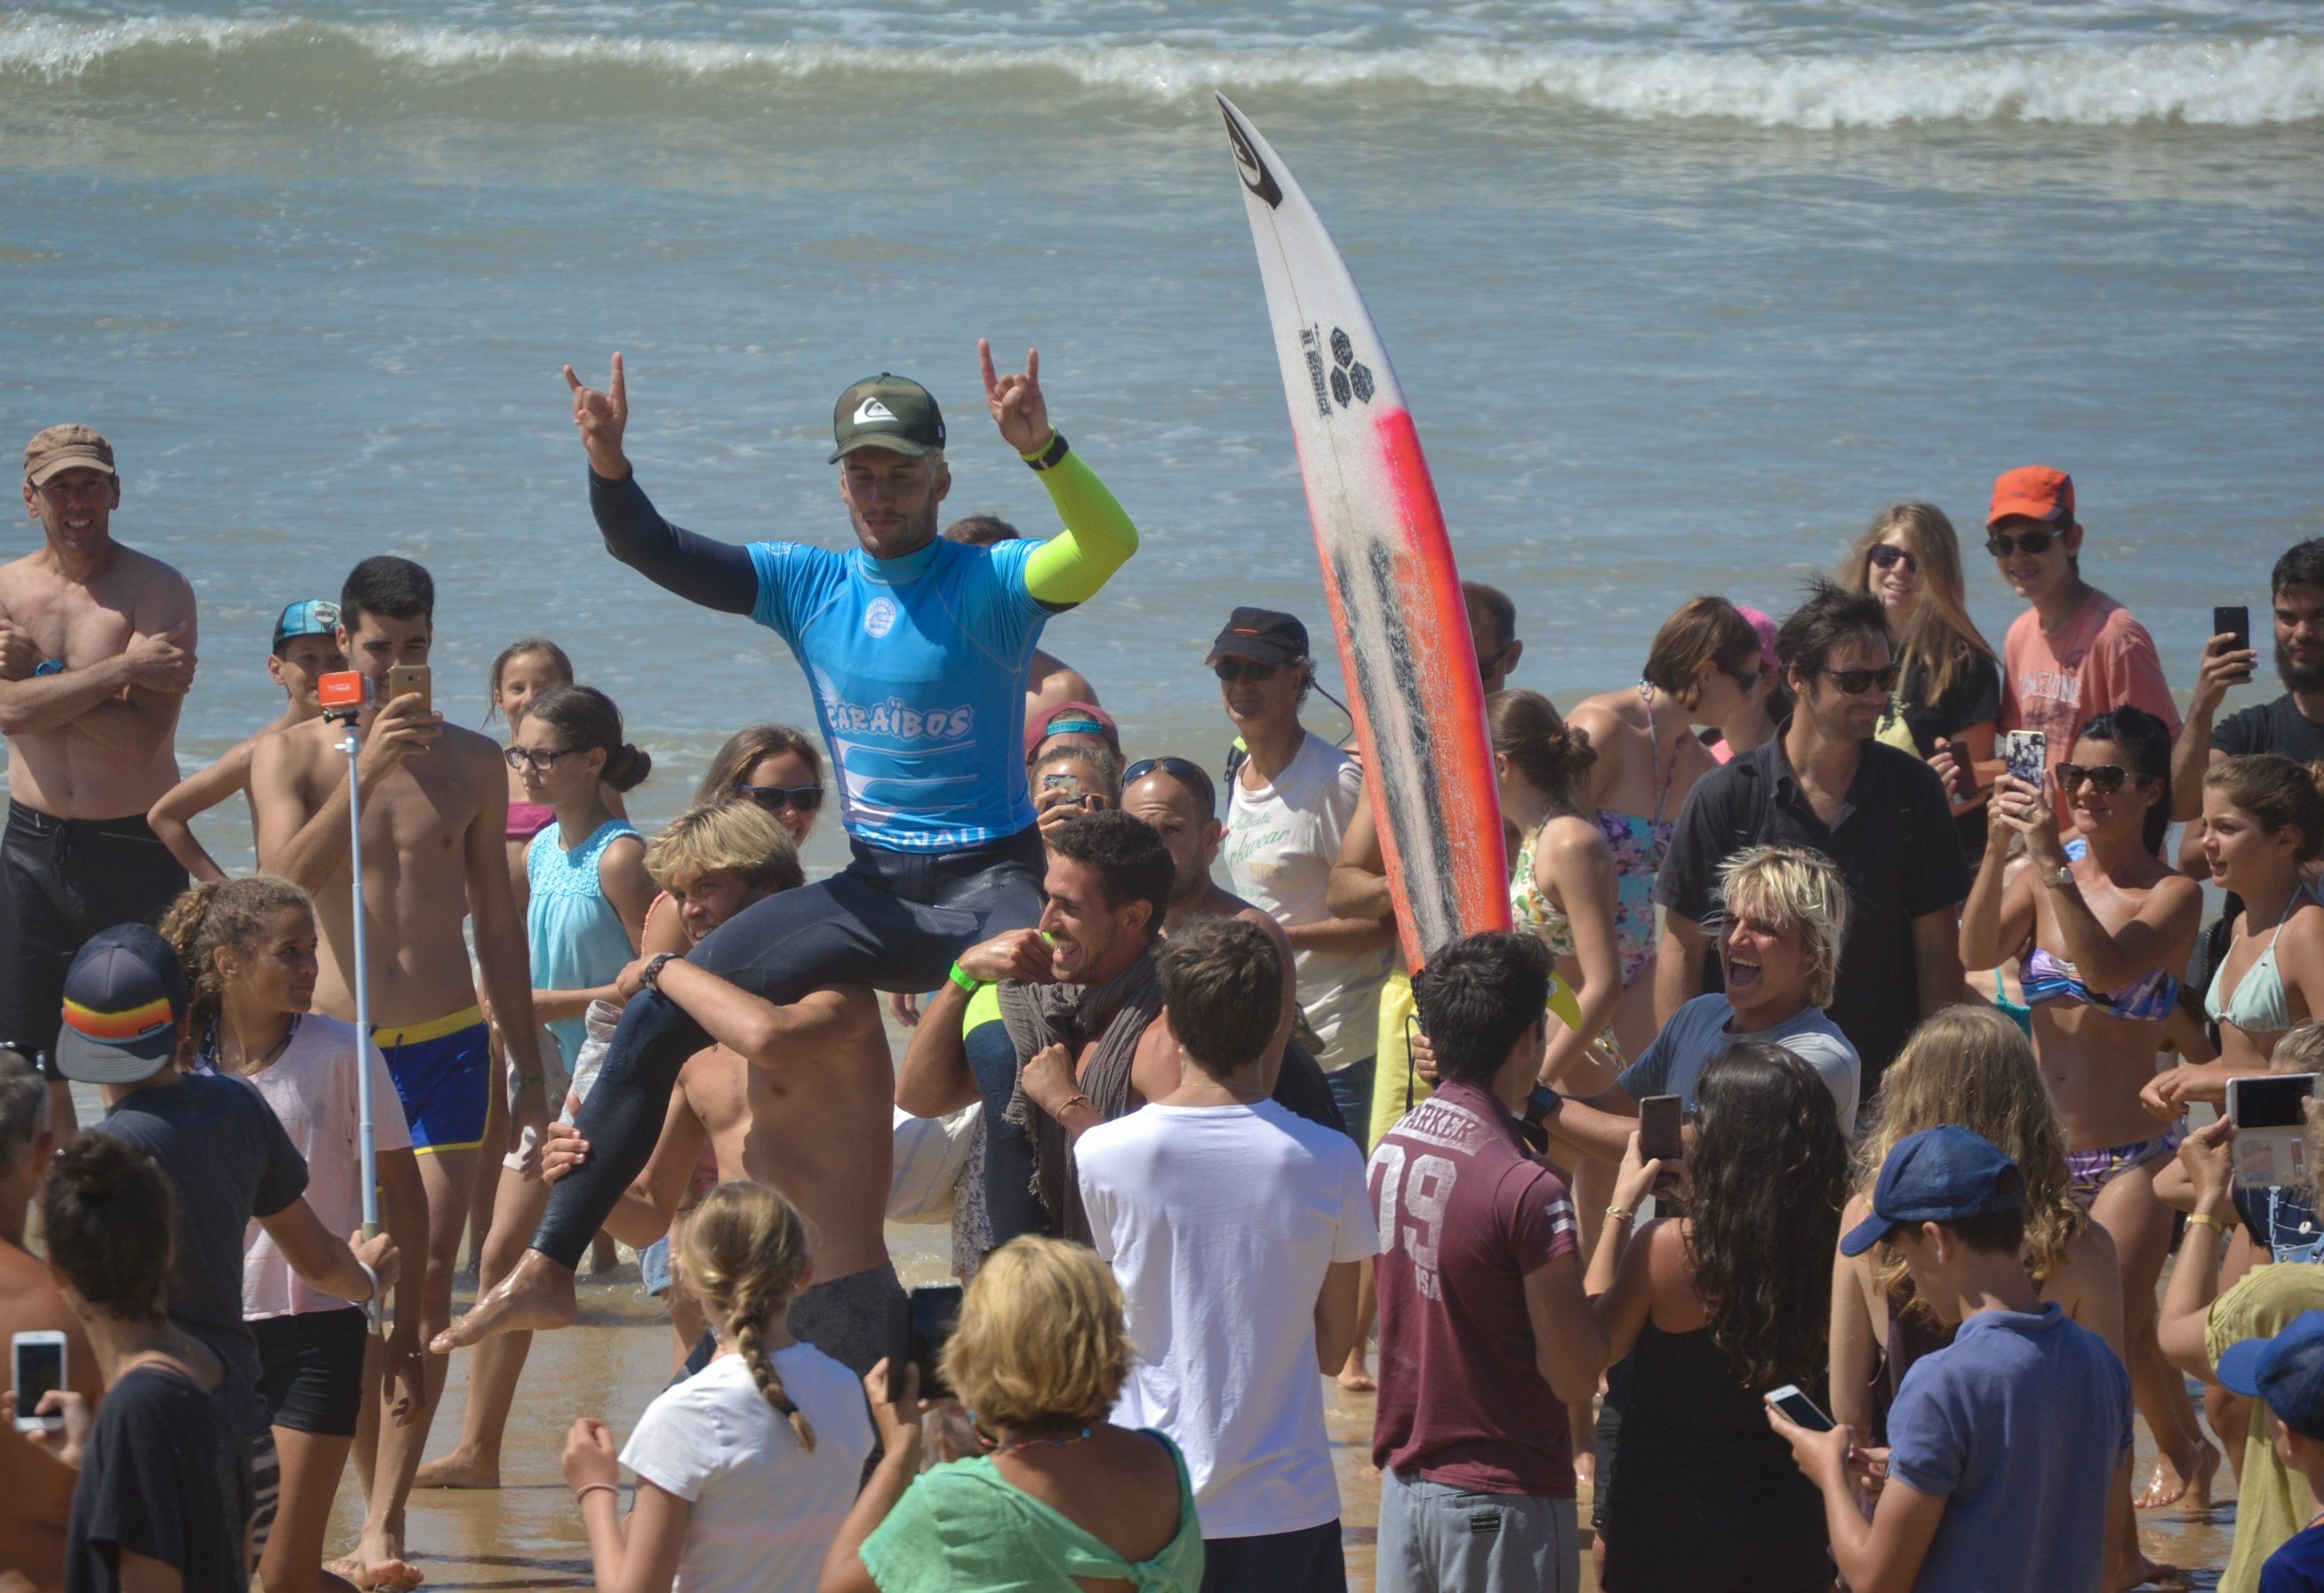 caraibos-lacanau-pro-surf-blog-voyage-les-ptits-touristes-wsl-ramzi-boukhiam